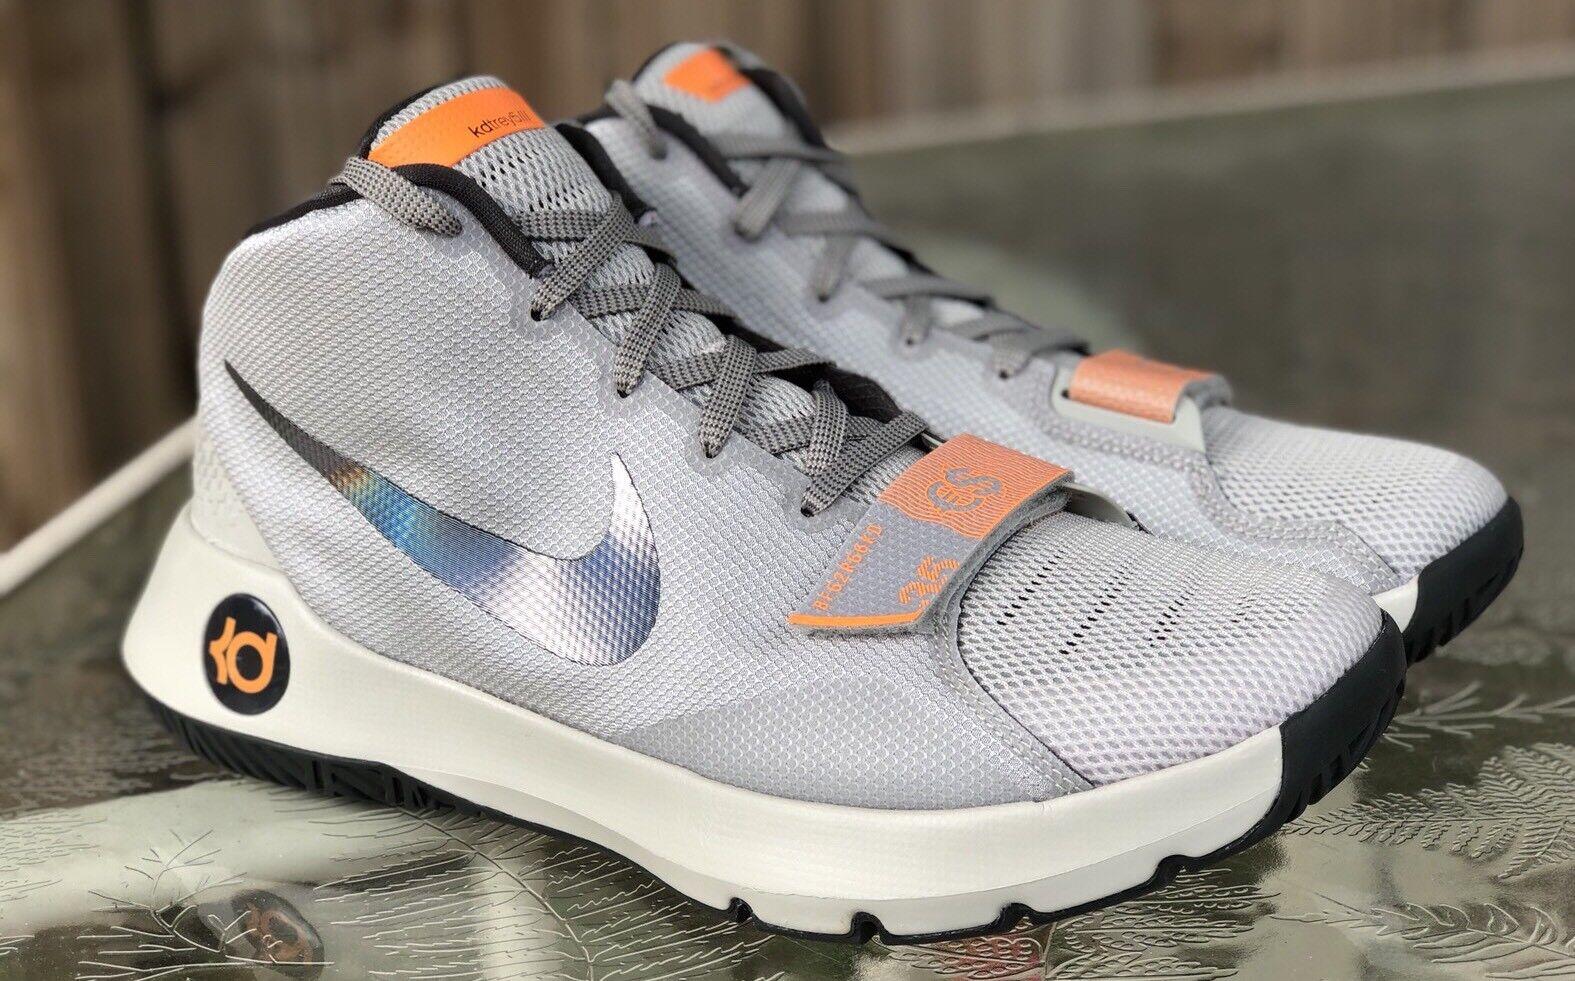 New Nike KD Trey 5 III  Gray Citrus Basketball Shoes Men Size 11.5